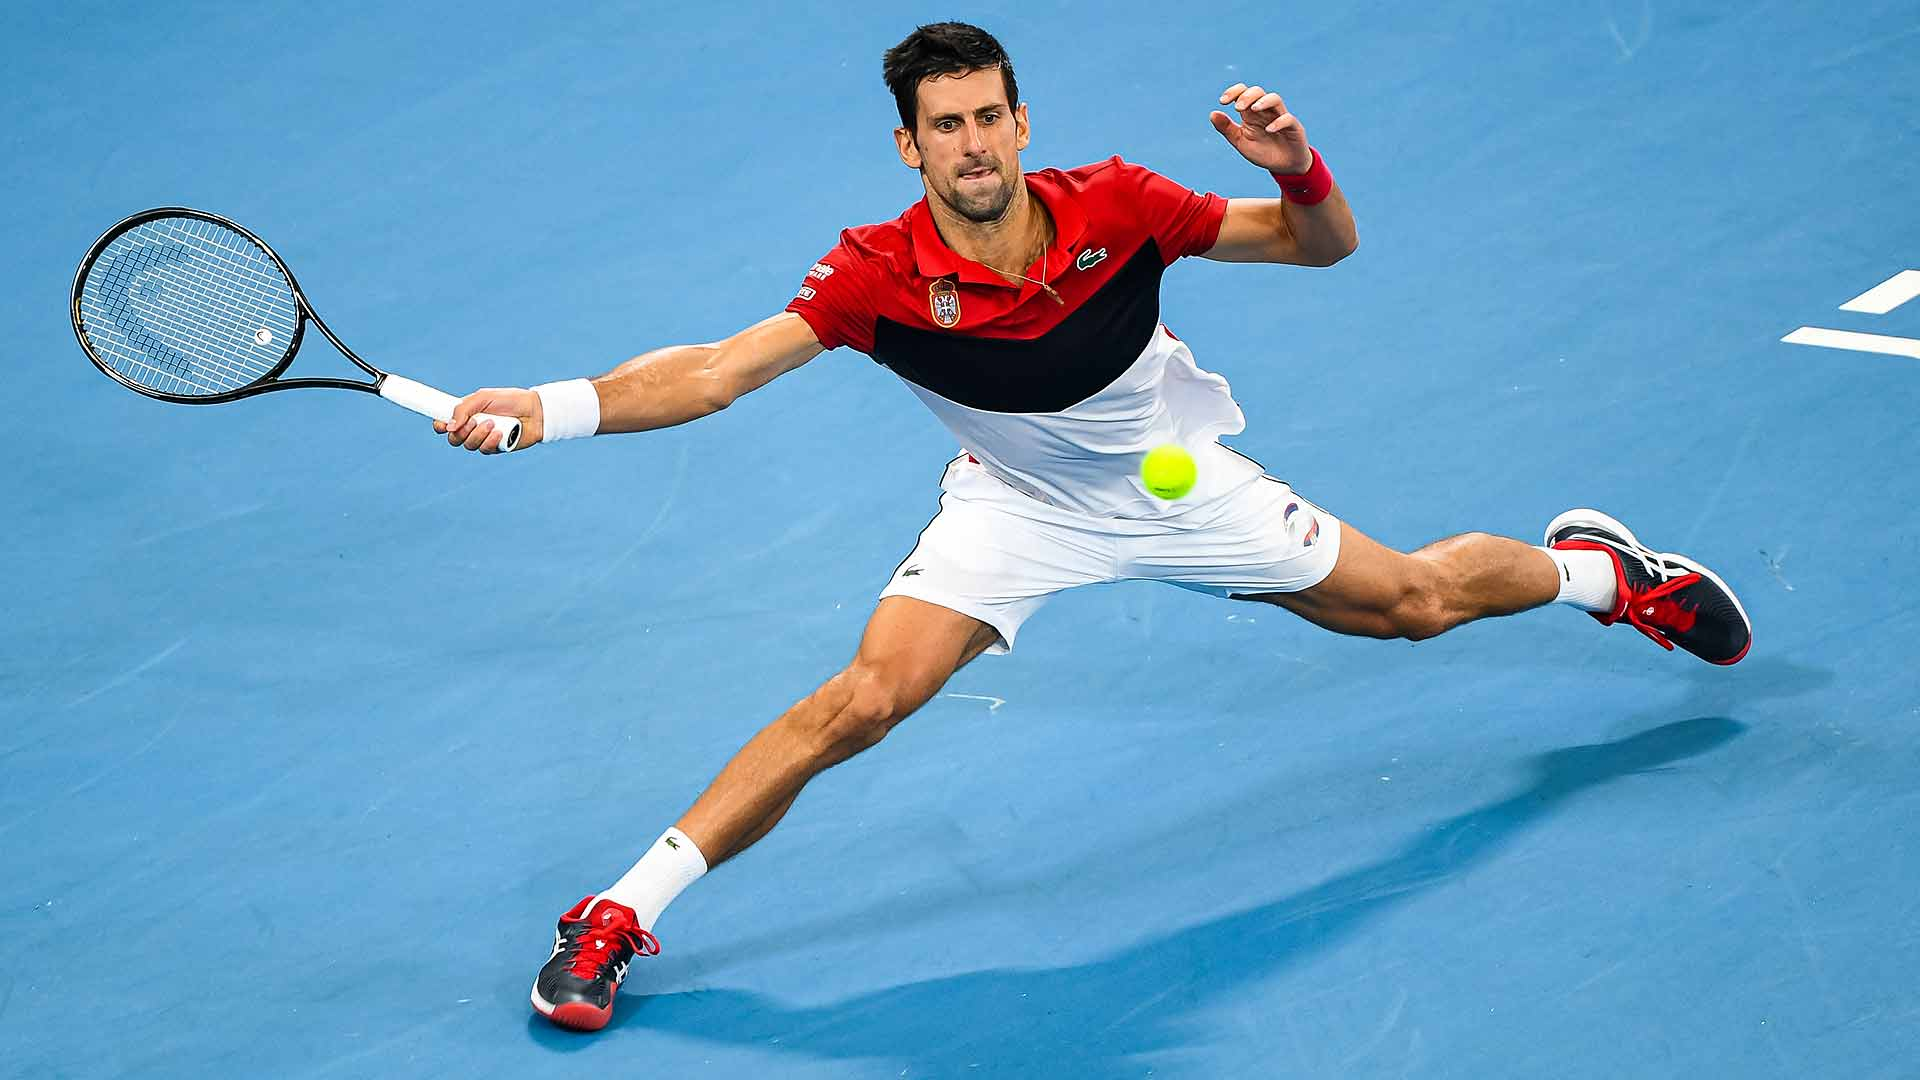 Atp Cup Novak Djokovic On Daniil Medvedev Epic Exciting Exhausting Joyful Dreadful All At Once Atp Tour Tennis